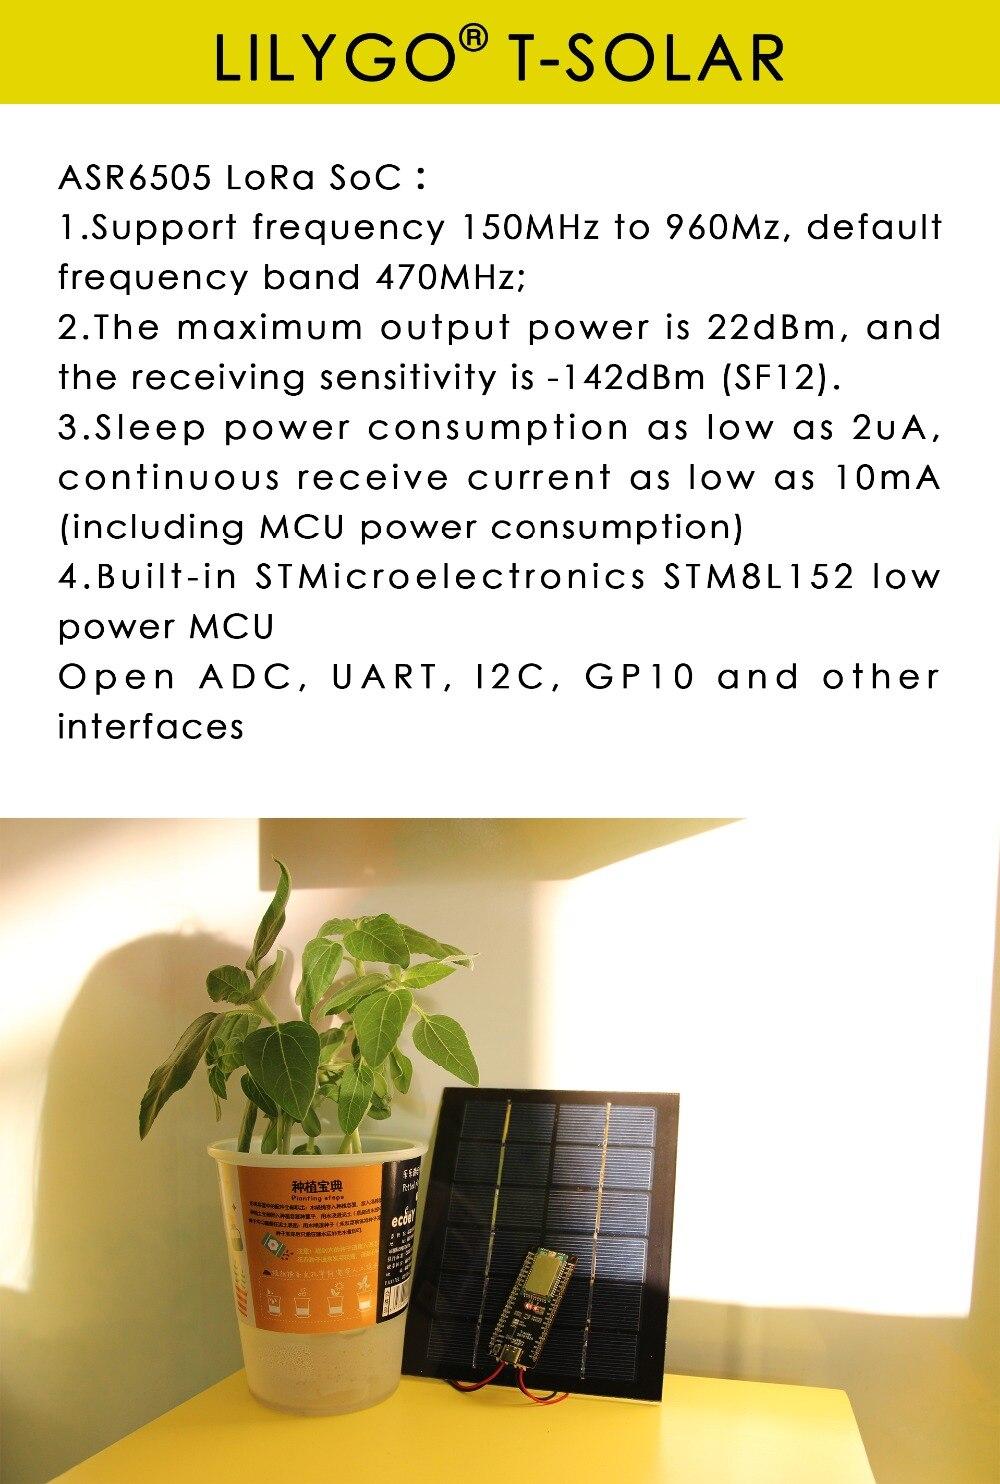 LILYGO® TTGO T-Solar 433MHz Solar Power Development Board STM8L152 CPU SX1262 Lora With Antenna